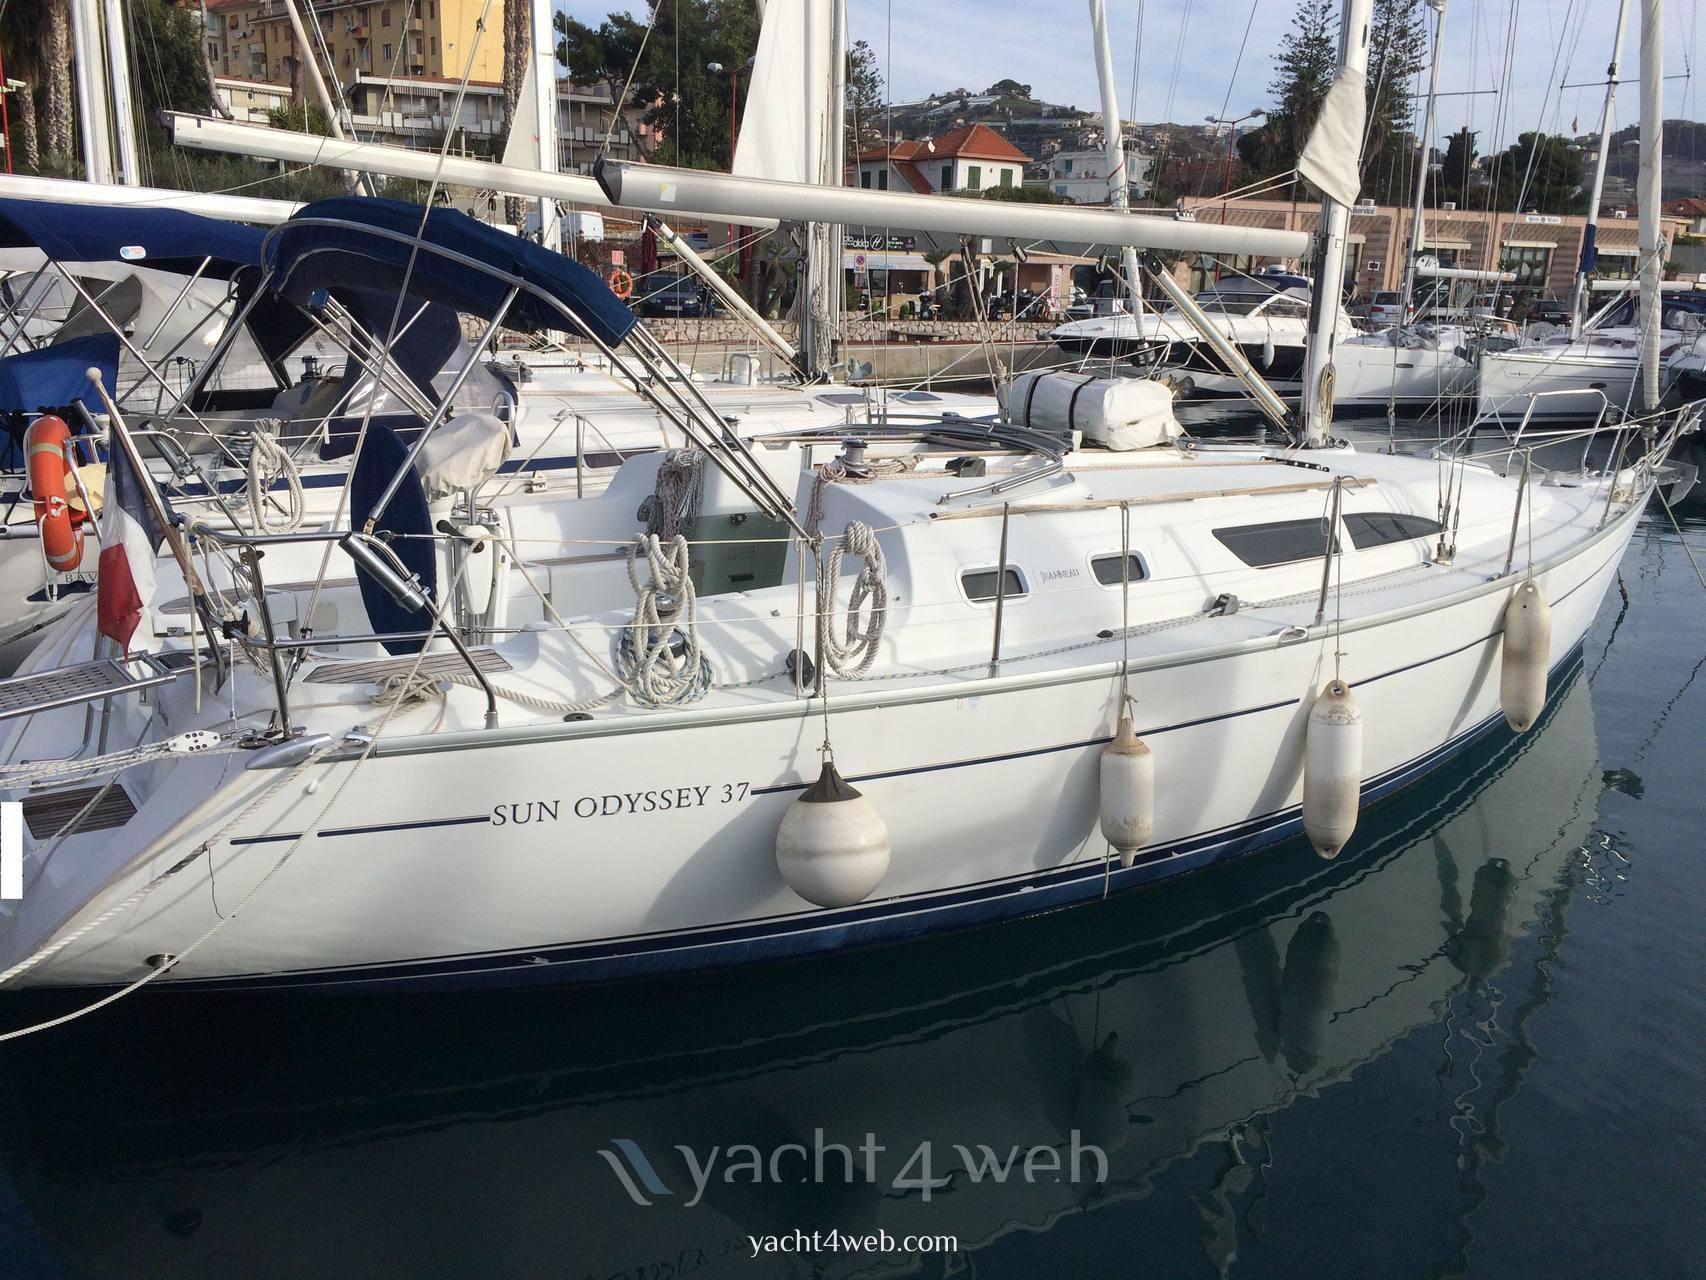 JEANNEAU Sun odyssey 37 Barca a vela usata in vendita